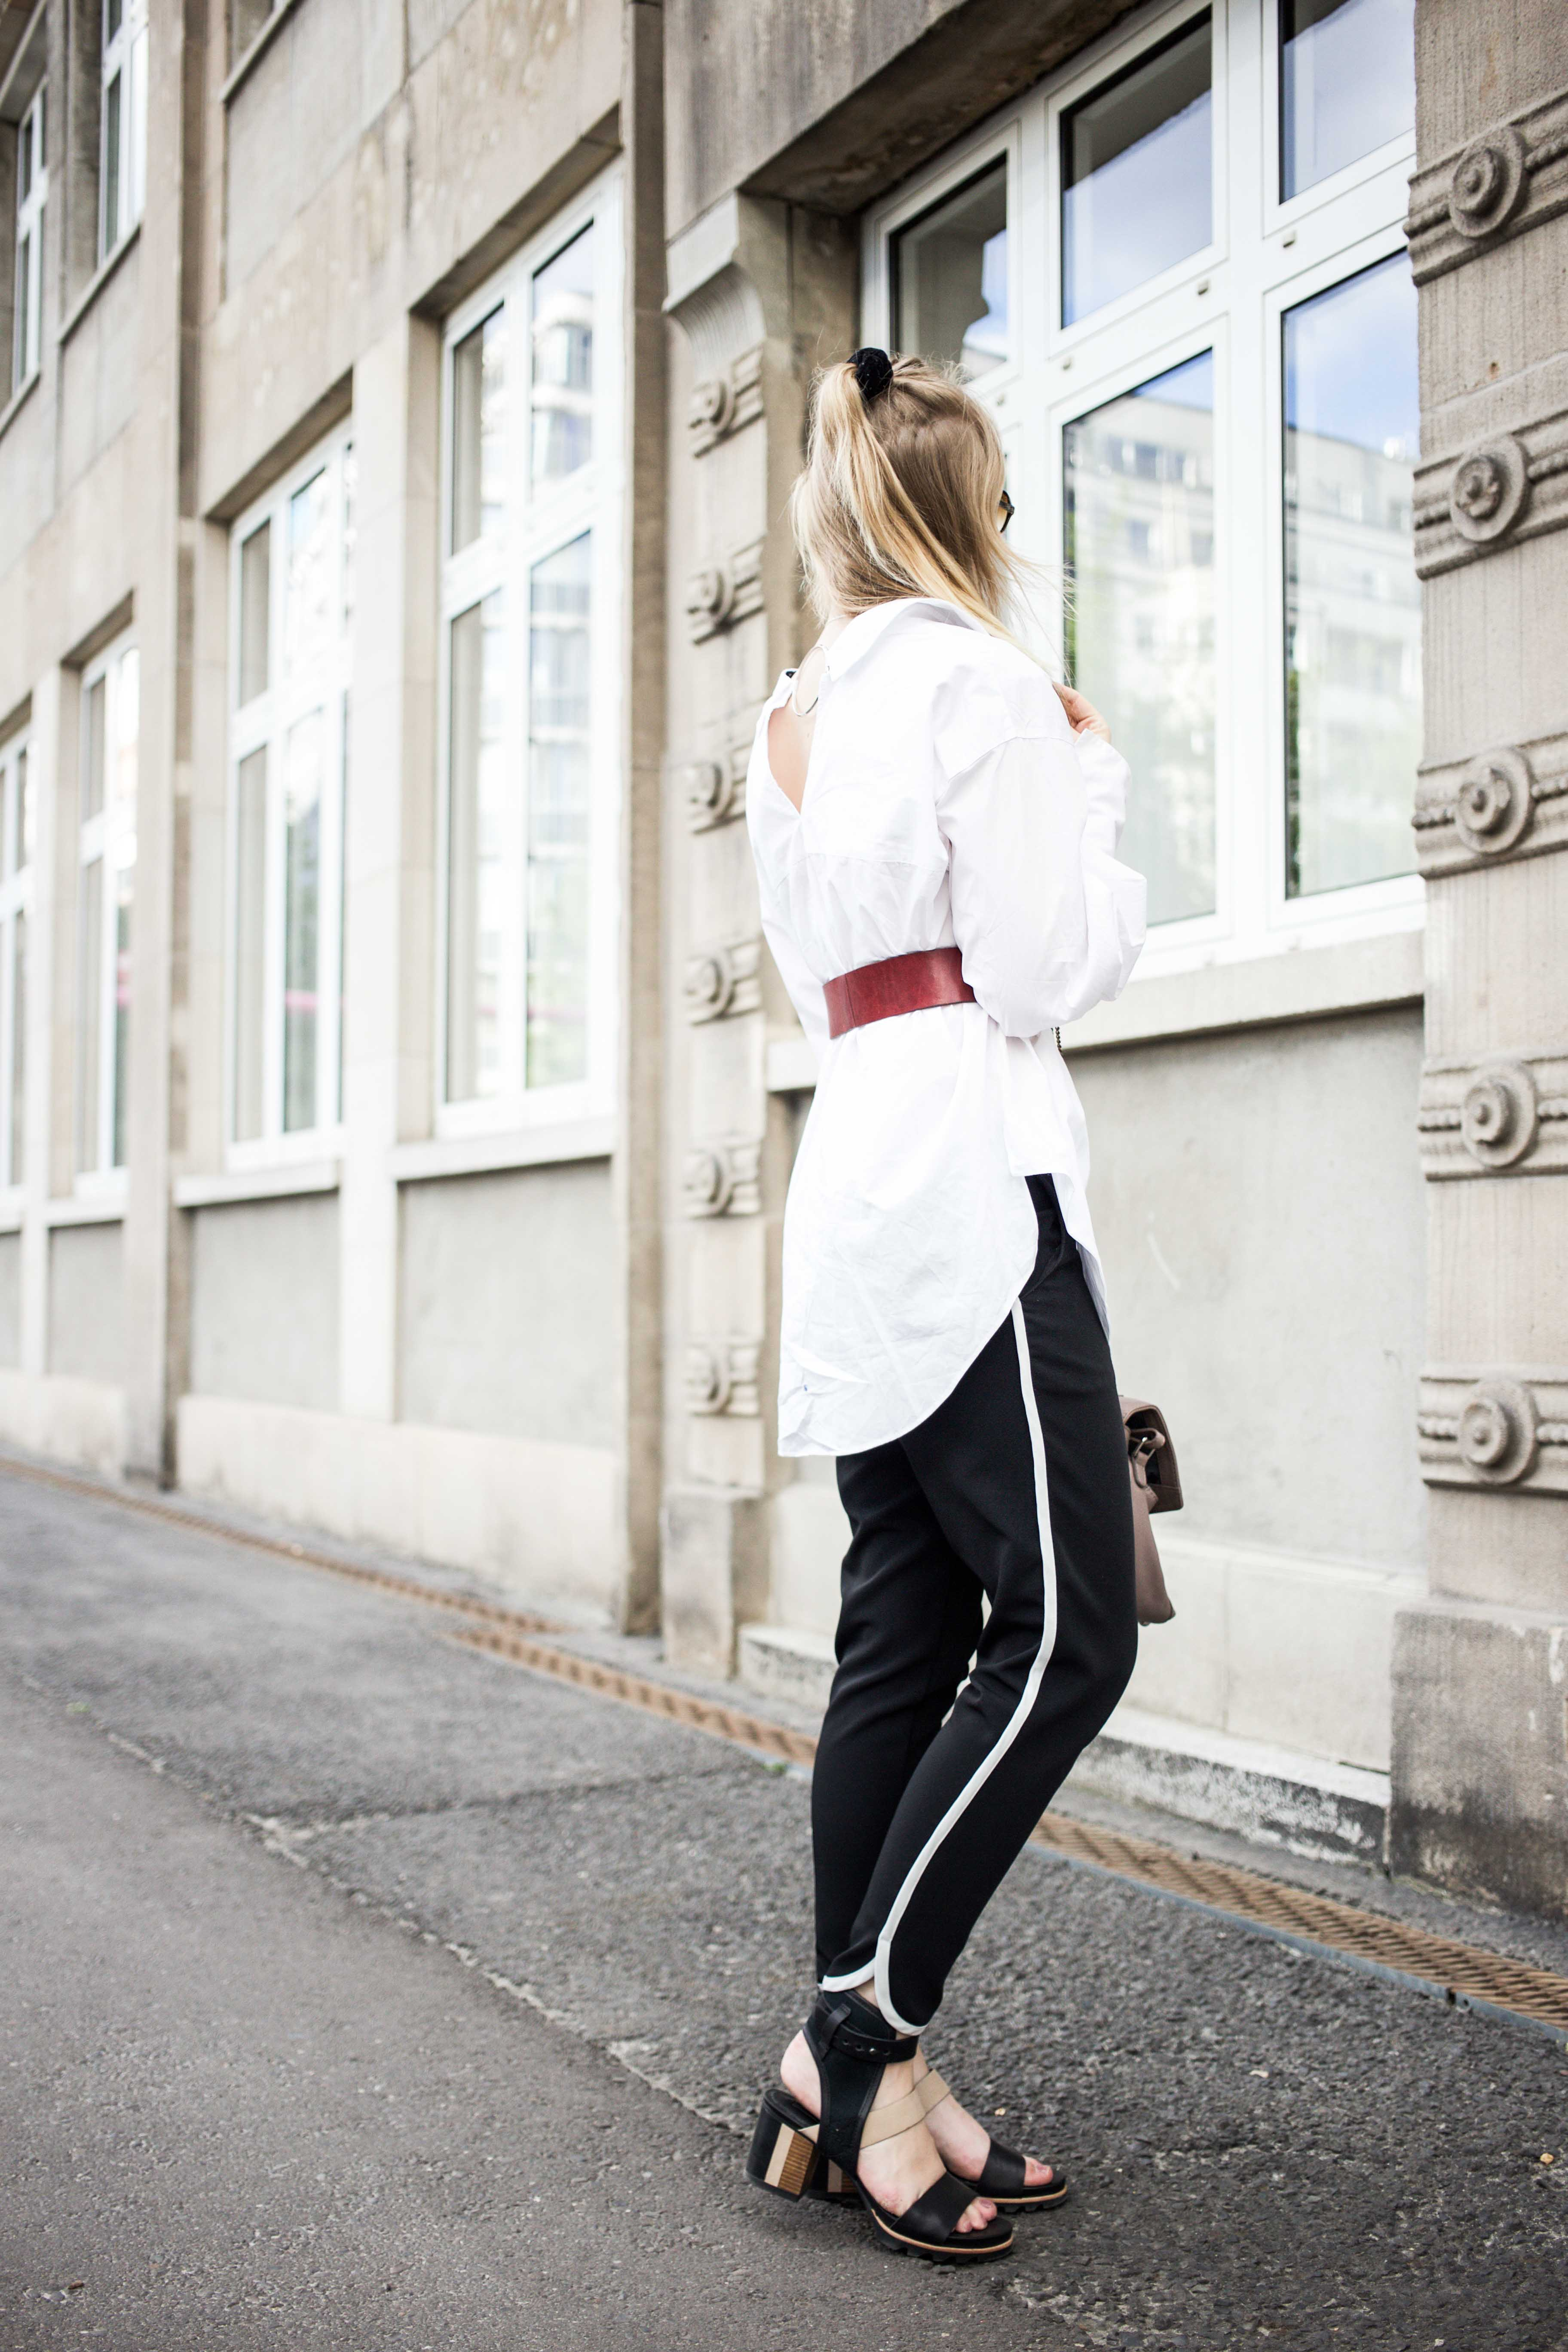 fashionweek-berlin-statement-gürtel-oversized-bluse-outfit-modeblog_6249